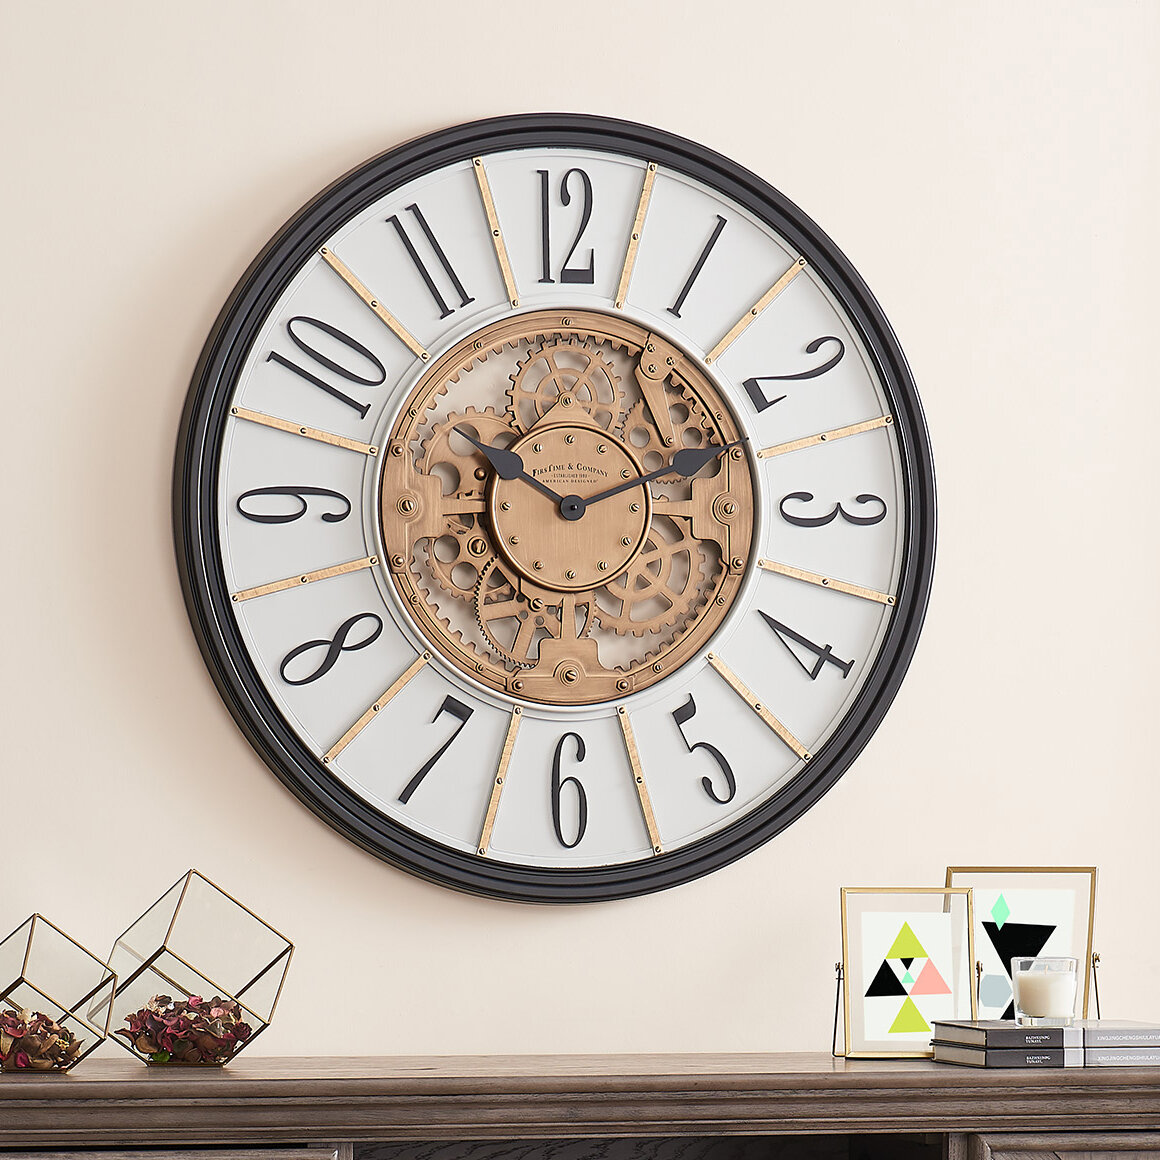 Analog Brass Wall Clocks You Ll Love In 2021 Wayfair